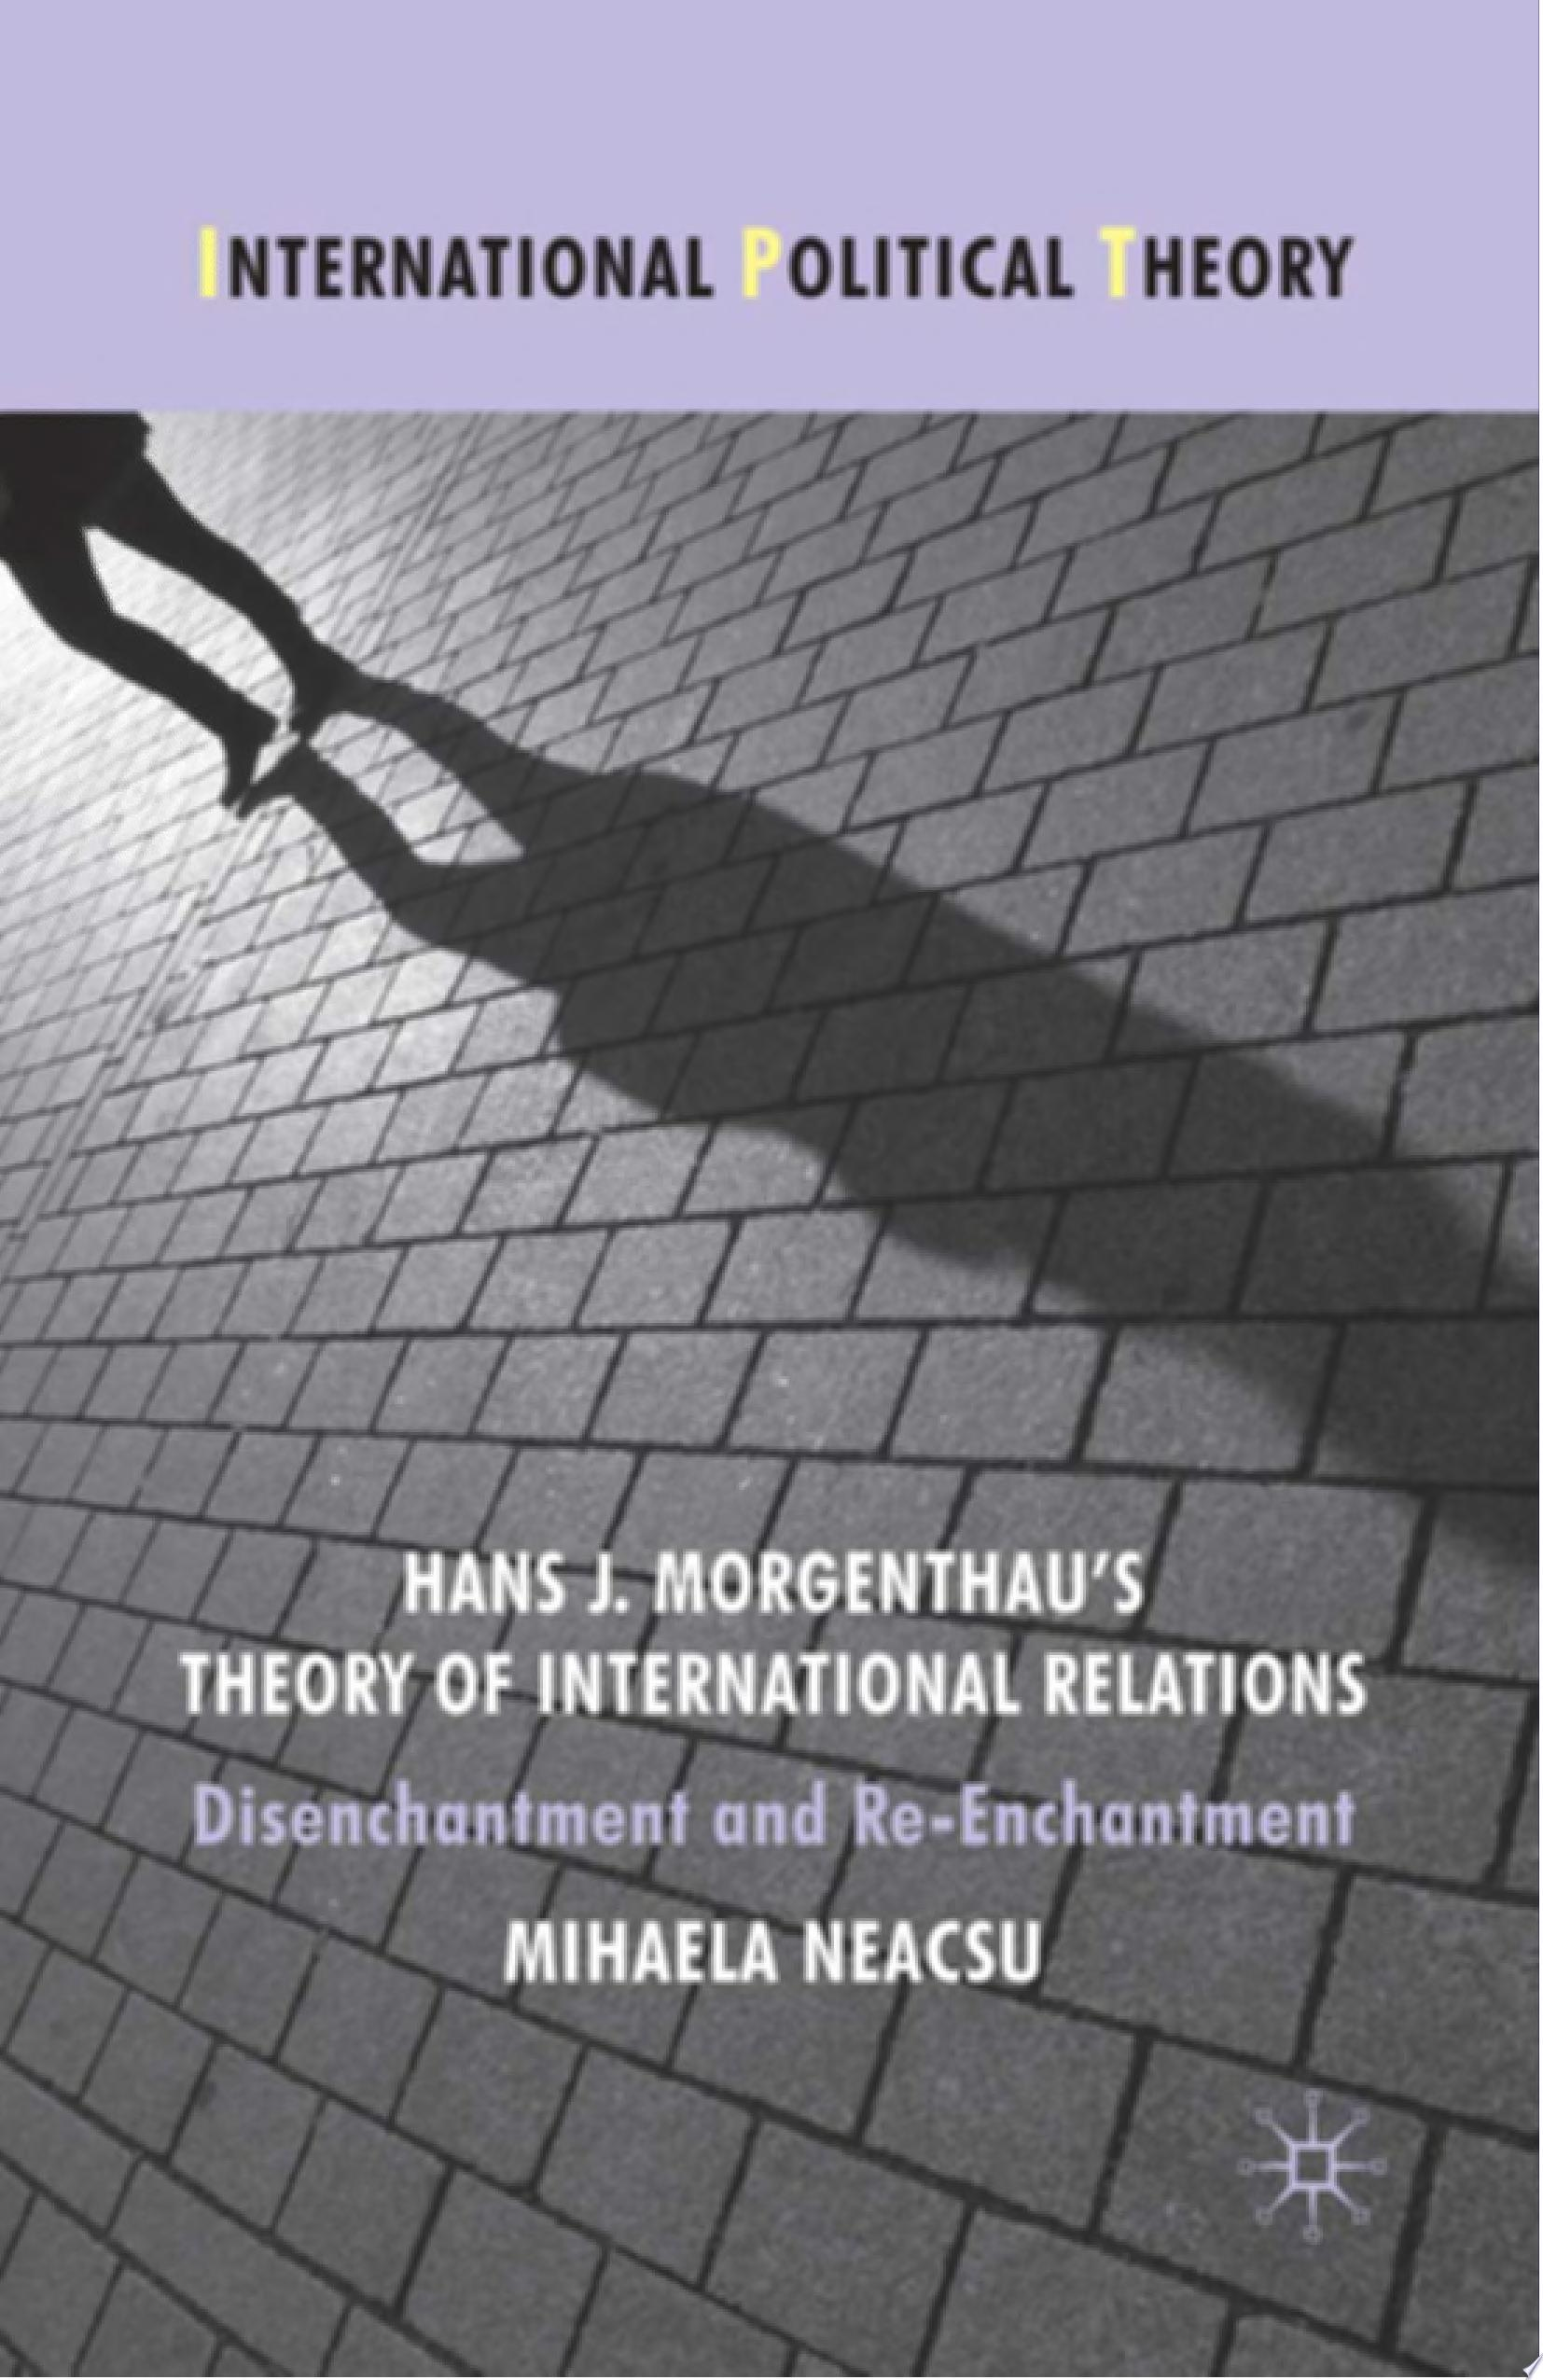 Hans J  Morgenthau s Theory of International Relations